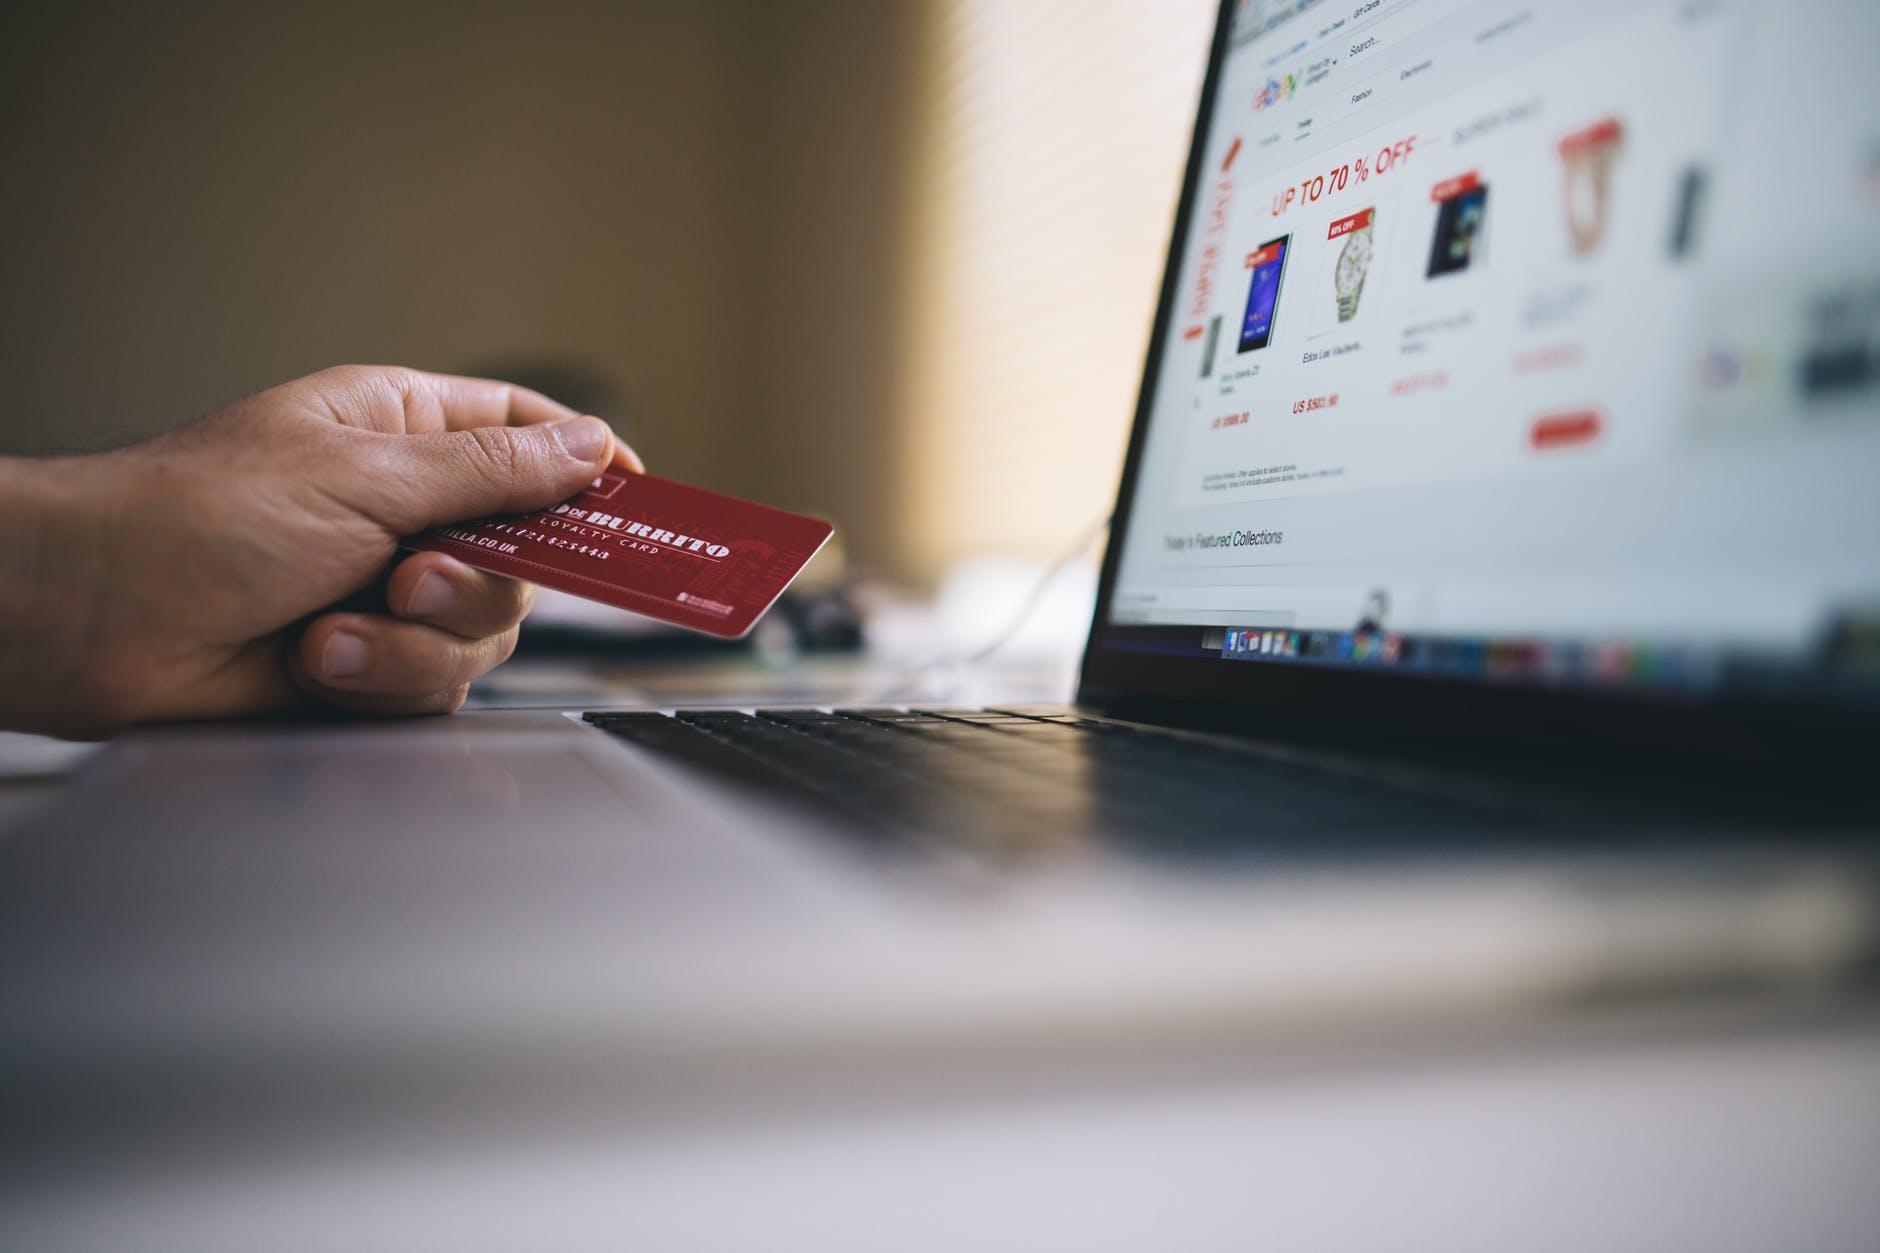 create-a-successful-ecommerce-website